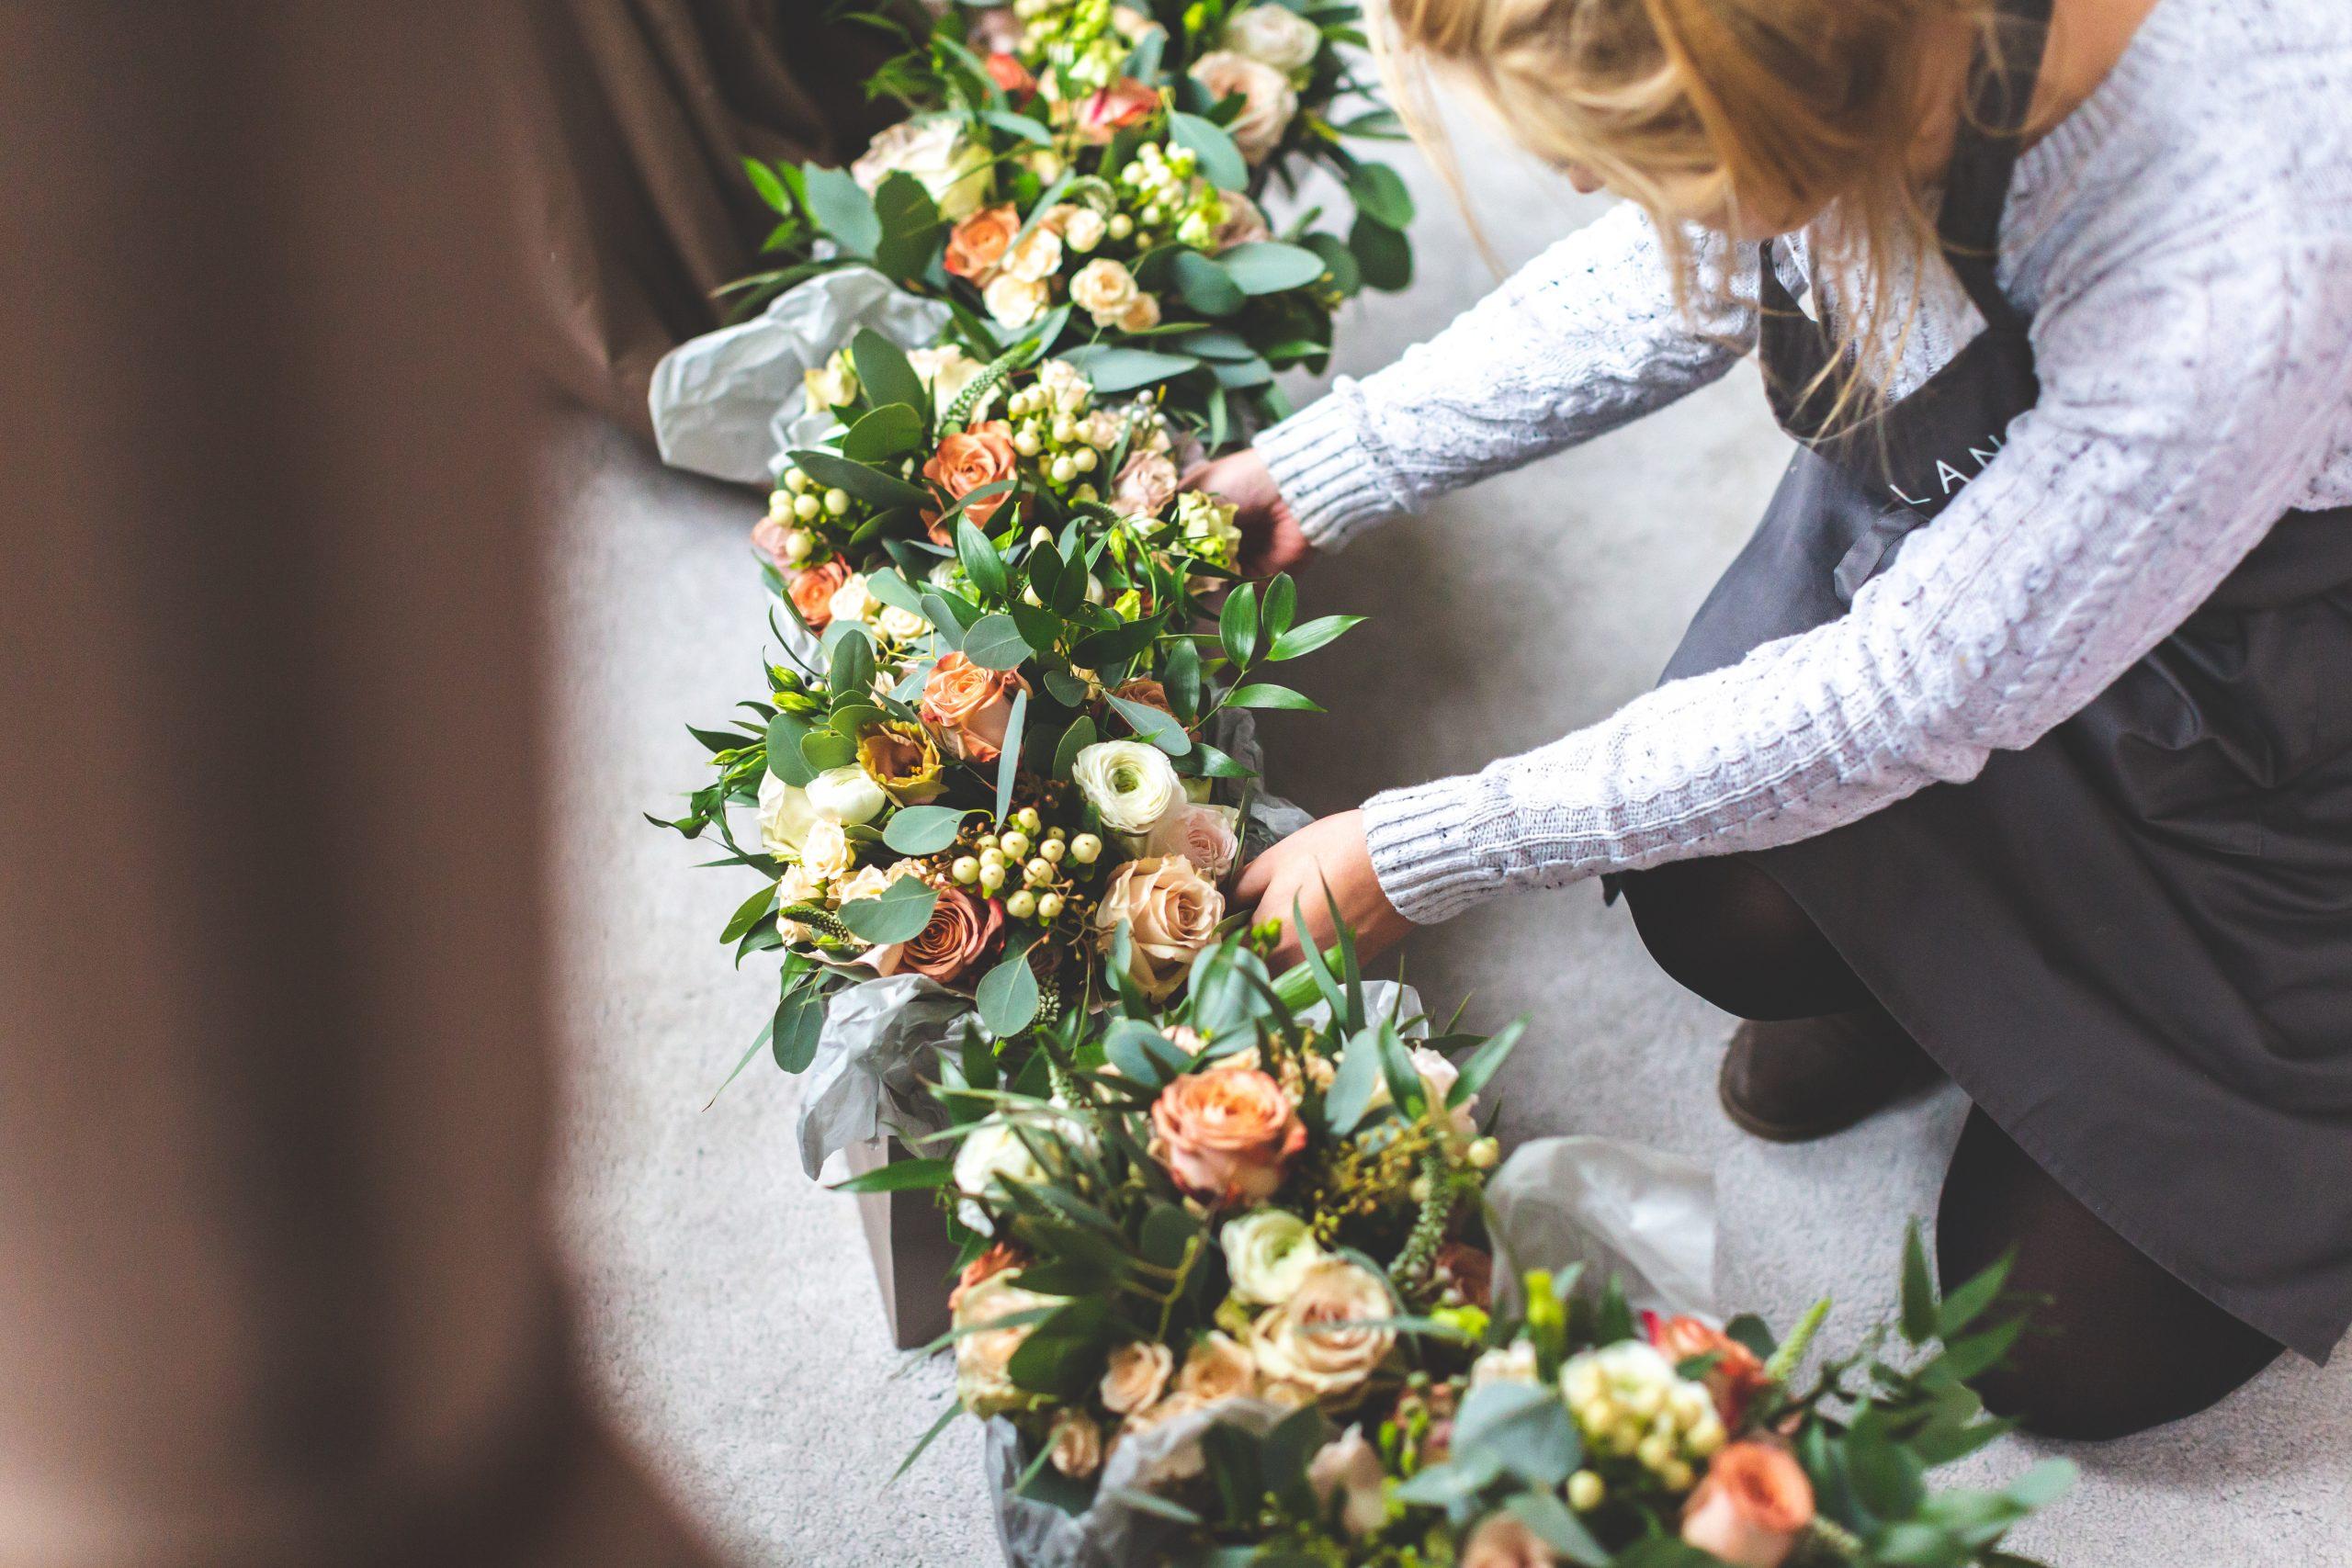 Daisy Lane Floral Design bouquets for wedding at Eastington Park